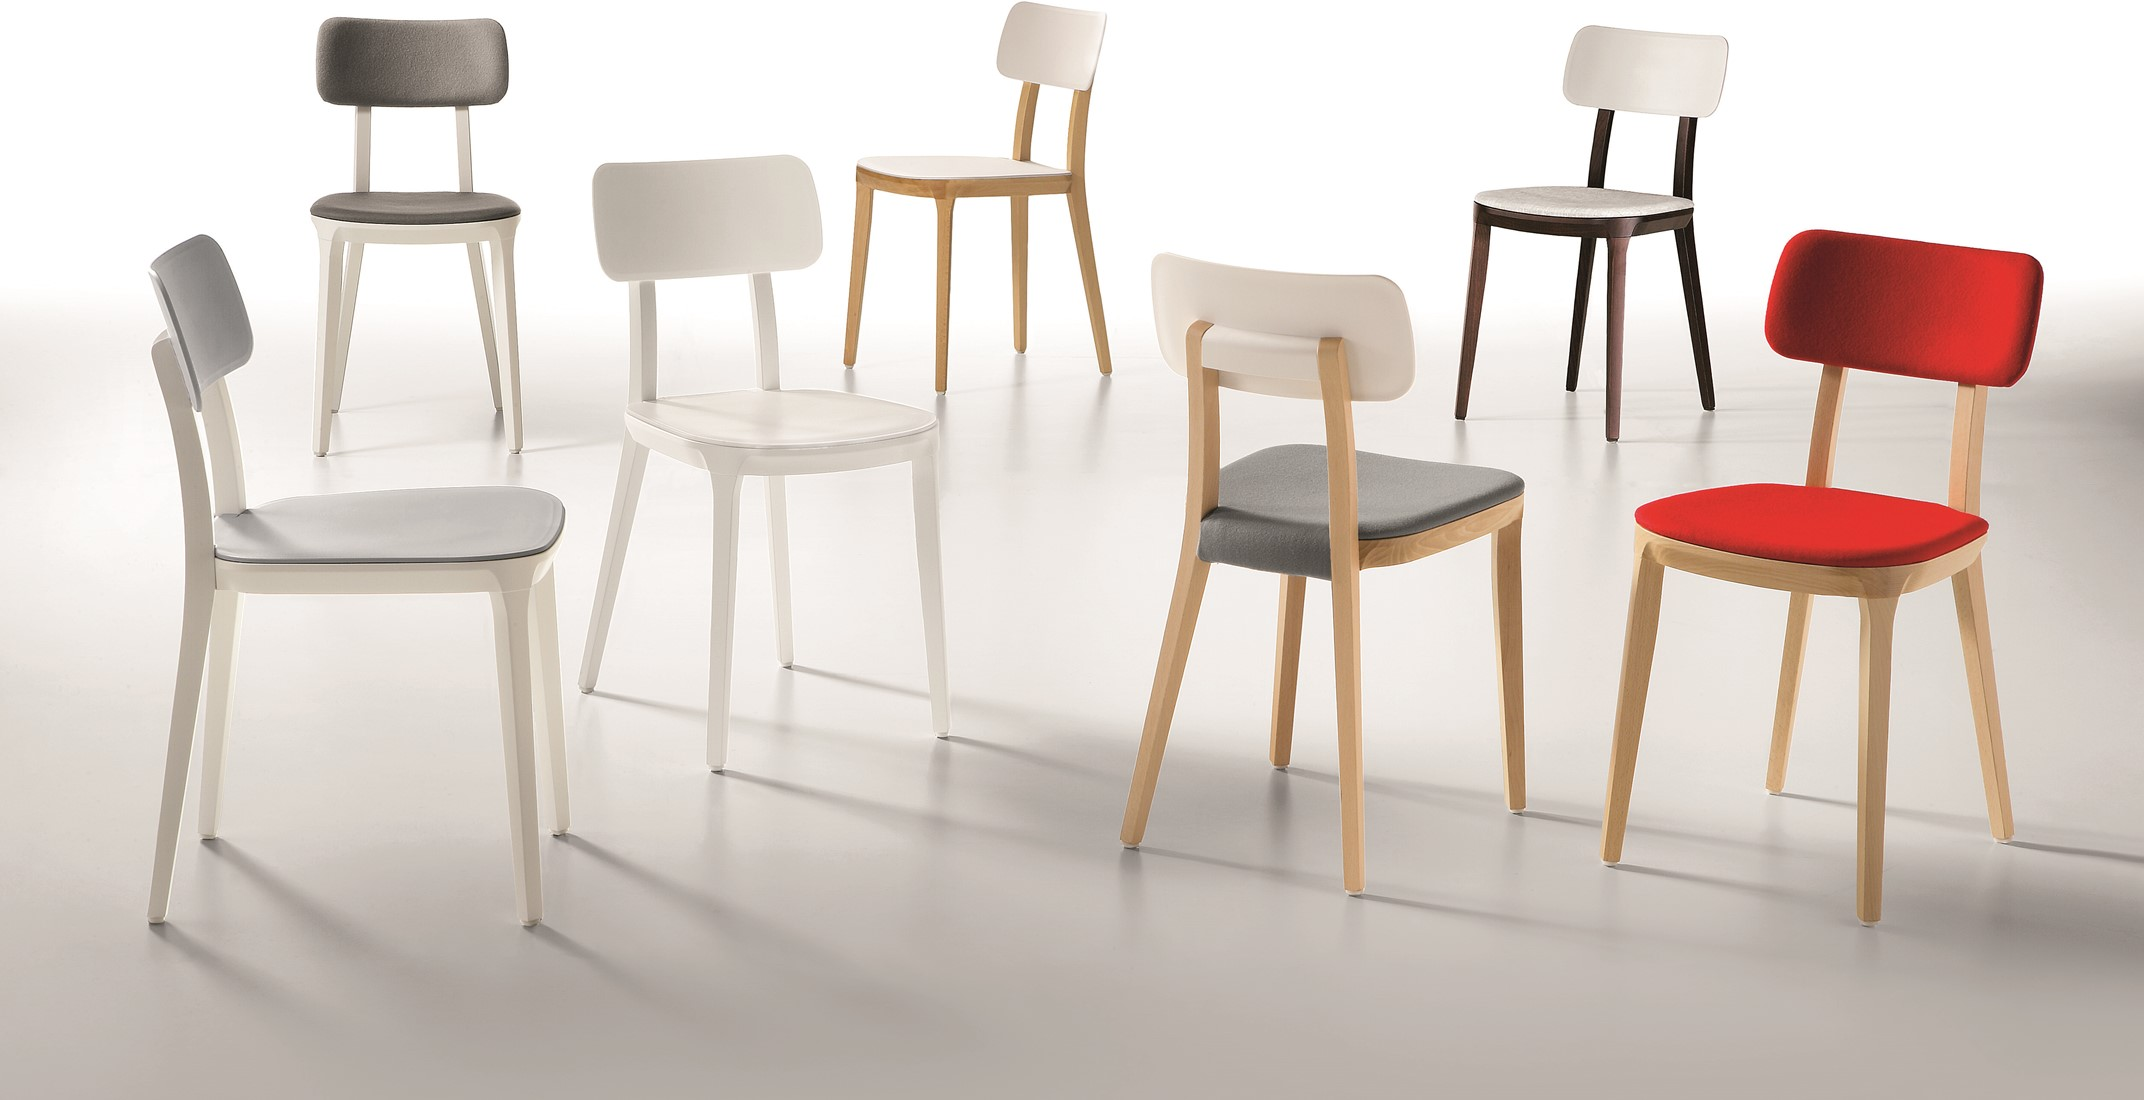 Spiksplinternieuw Porta Venezia UPH - houten keuken/ school stoel met gestoffeerde QJ-64